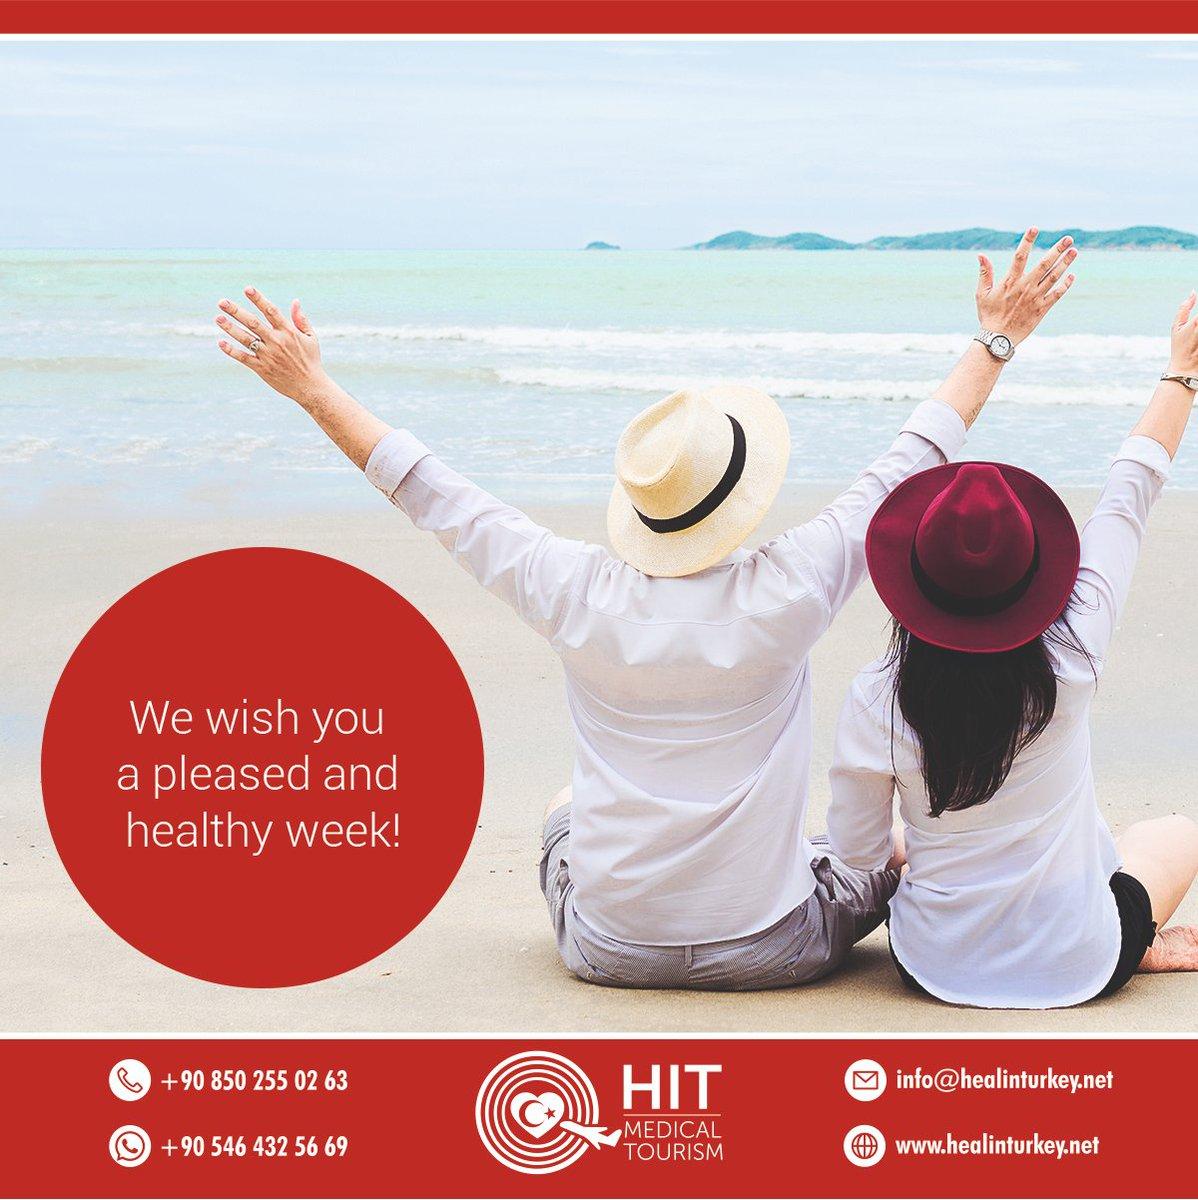 We wish you a pleased and healthy week!  #turkey #visitturkey #healthtourismturkey #turkeytravel #hairtransplant #cancercare #plasticsurgery #aestheticsurgery #nosejob #obesitysurgery #orthopedics #gammaknife #dentalturkey #implantturkey #dsd #digitalsmiledesign pic.twitter.com/3aSQJ1idsW